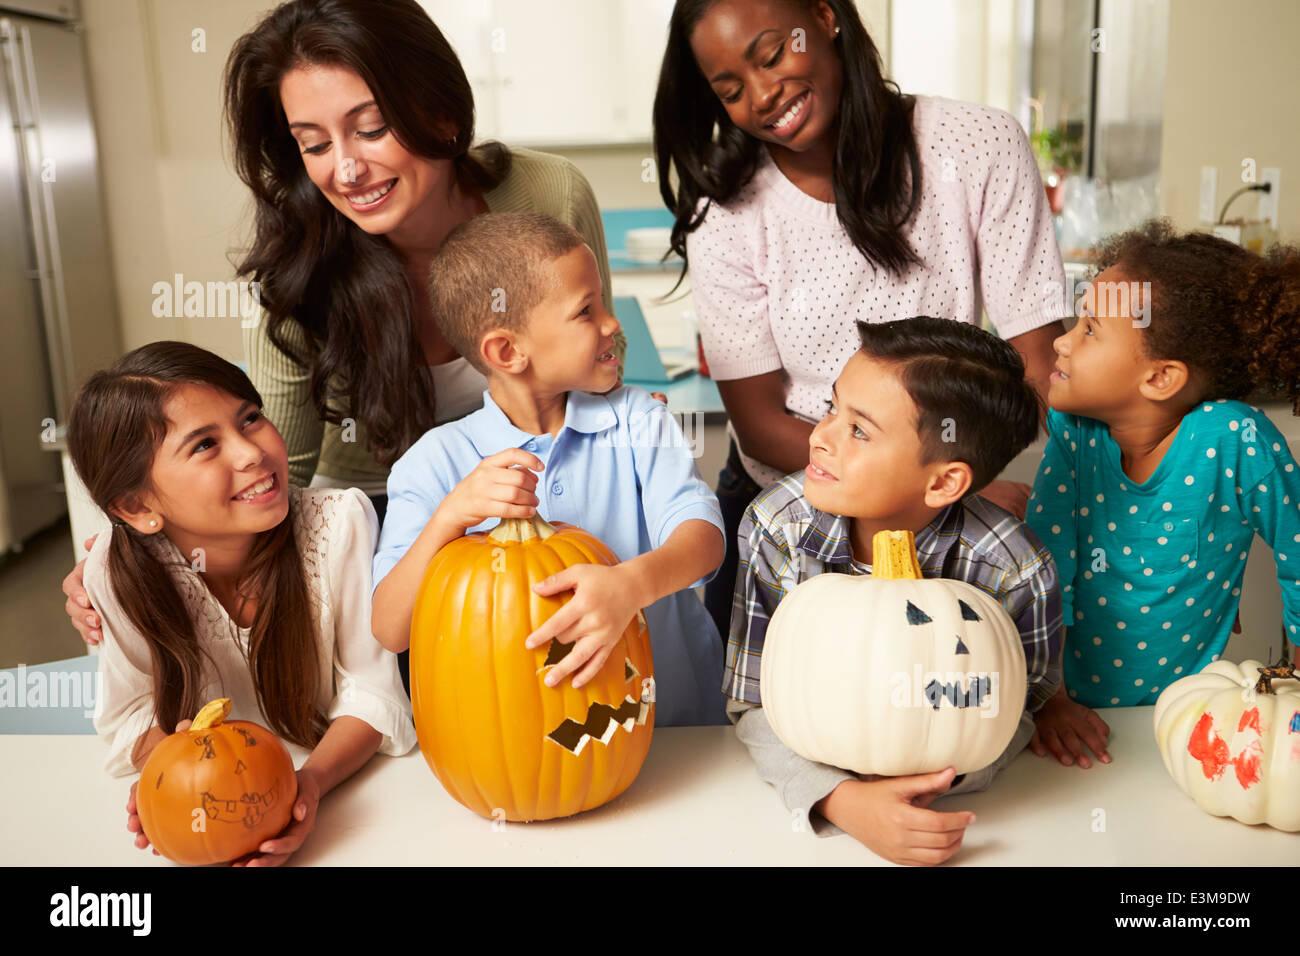 Mothers And Children Making Halloween Lanterns - Stock Image